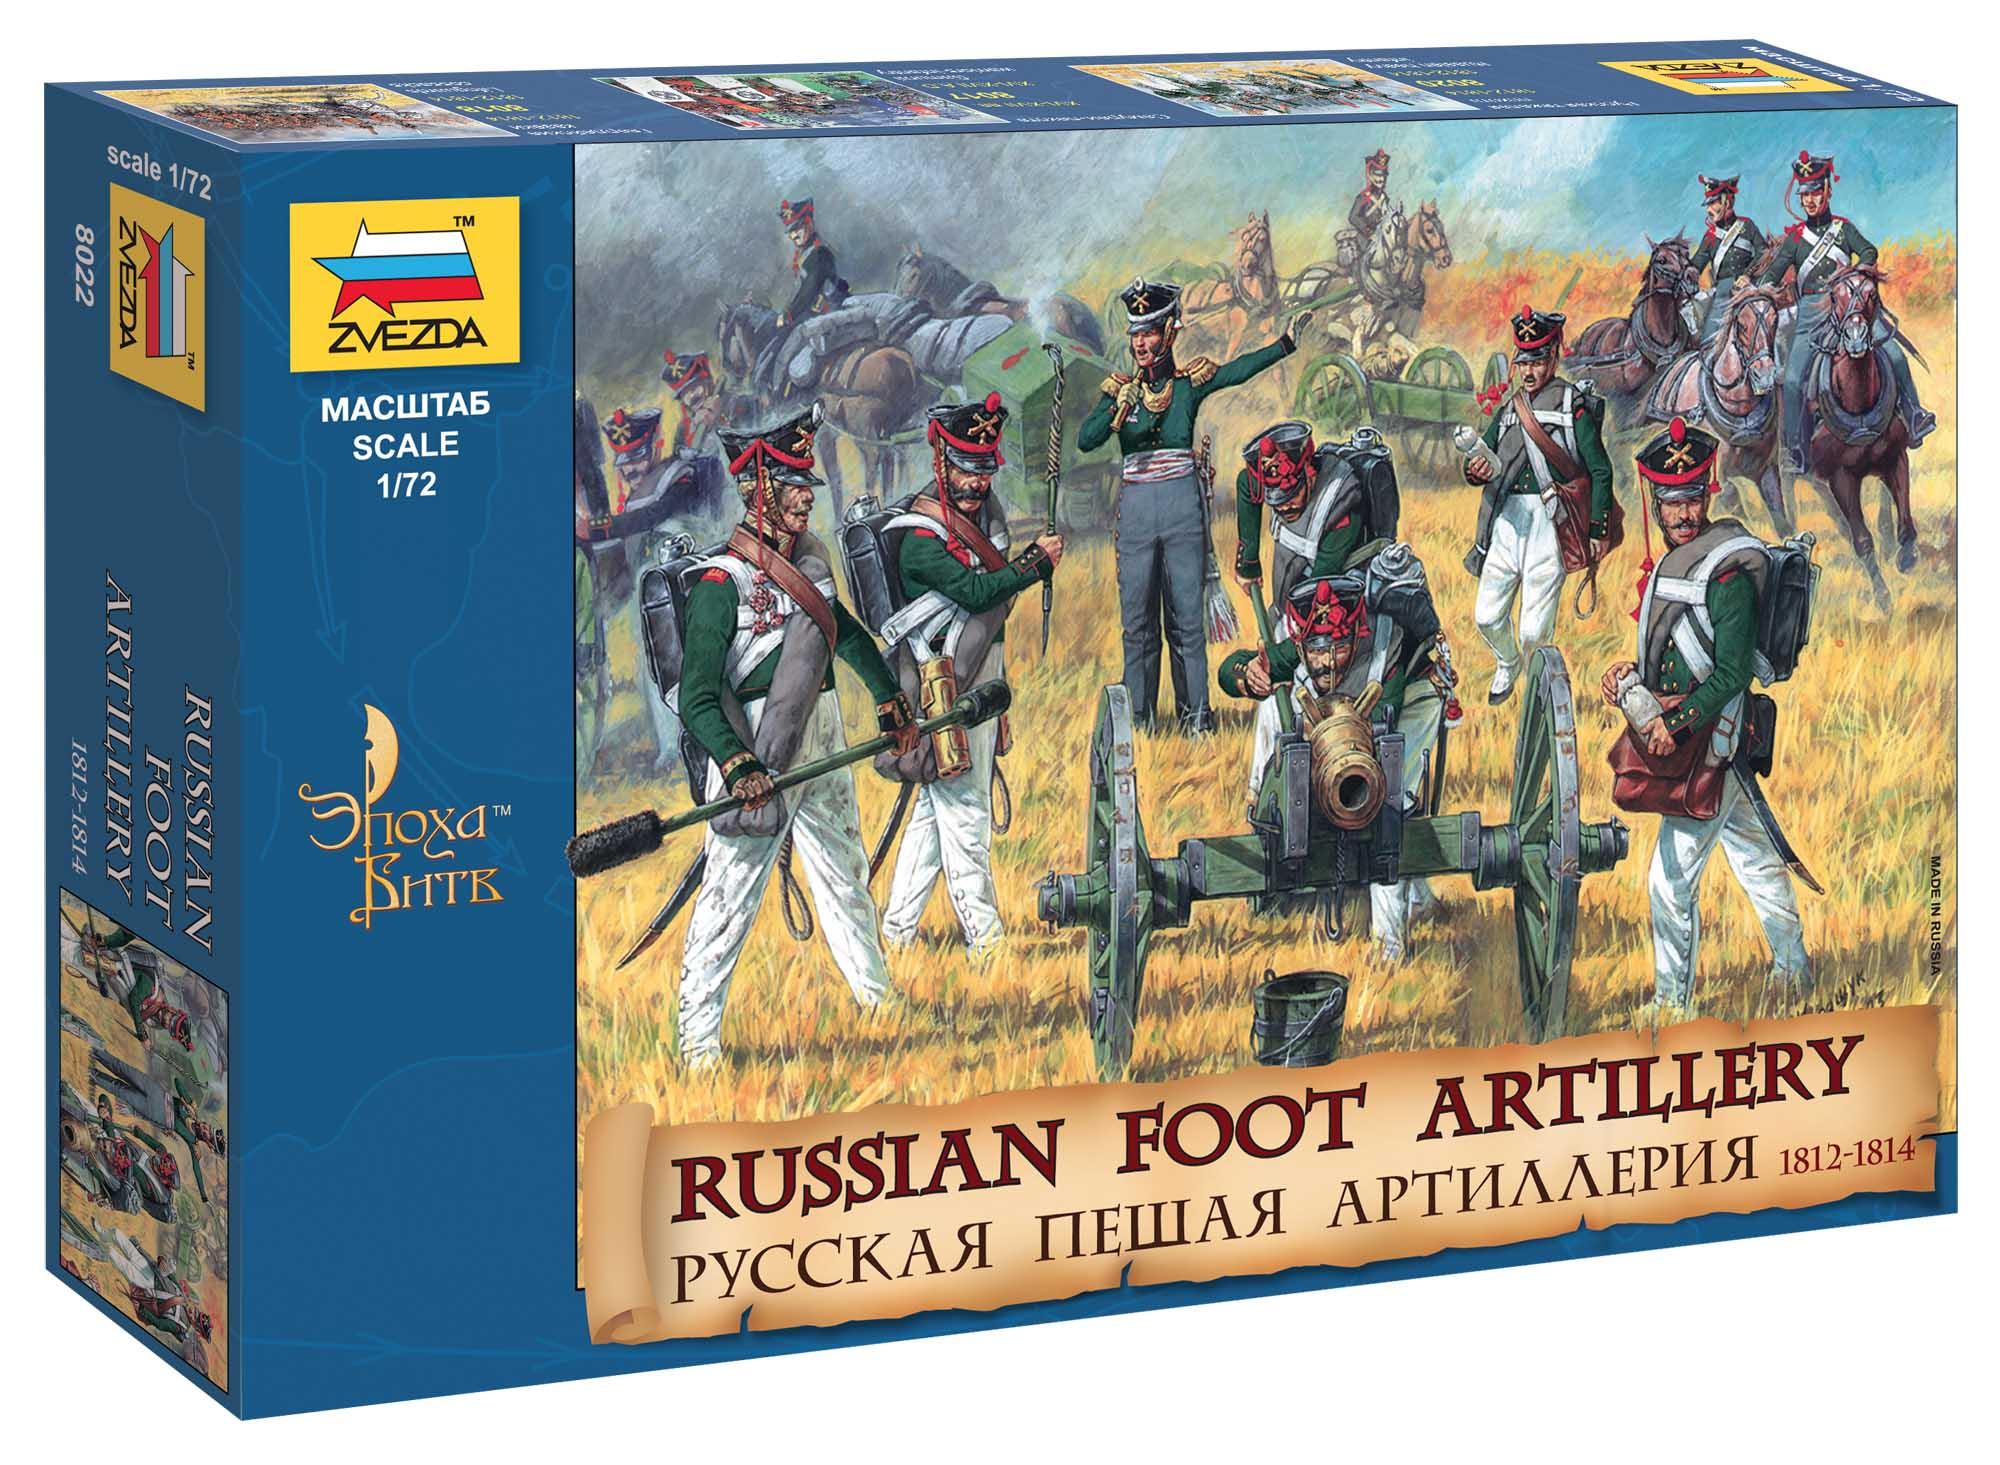 Náhľad produktu - 1:72 Russian Foot Artillery (1812-1814)